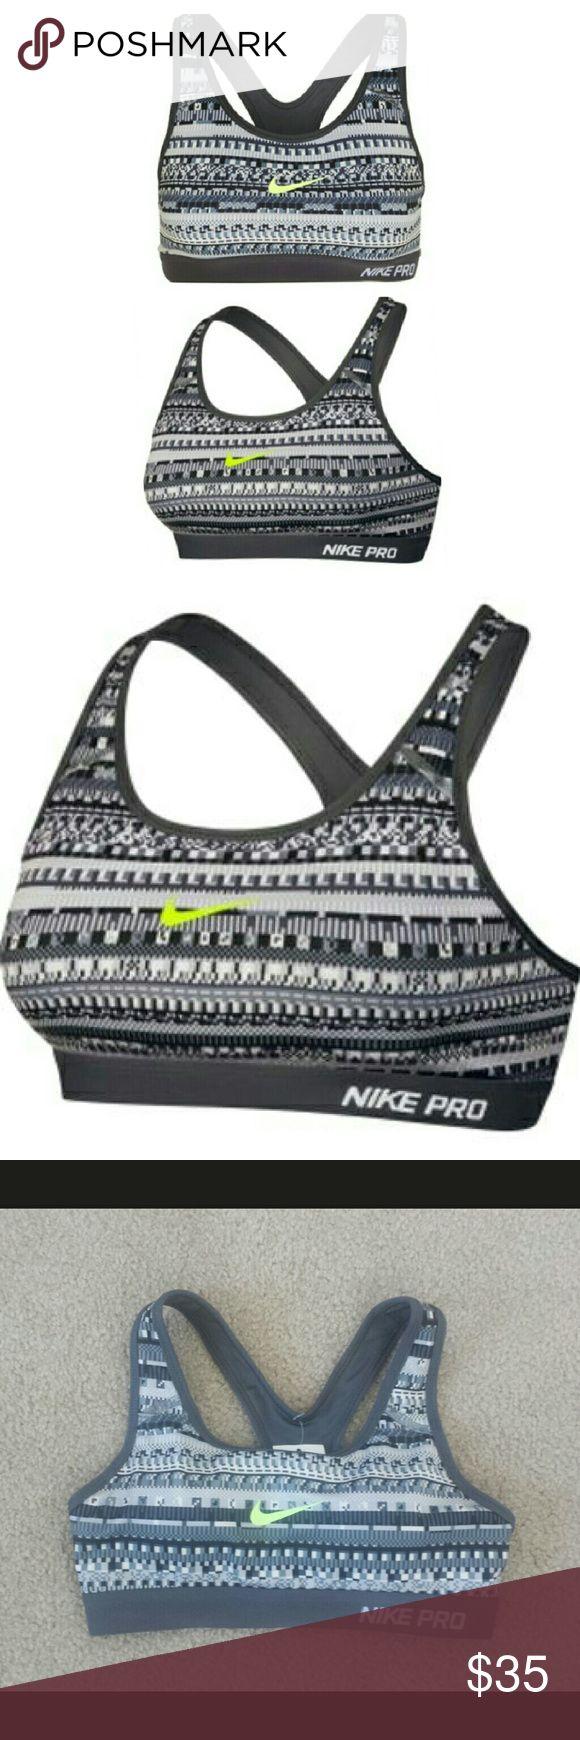 Nike padded Aztec printed sports bra w/neon swoosh NWT Nike padded Aztec printed sports bra with neon green swoosh Nike Intimates & Sleepwear Bras